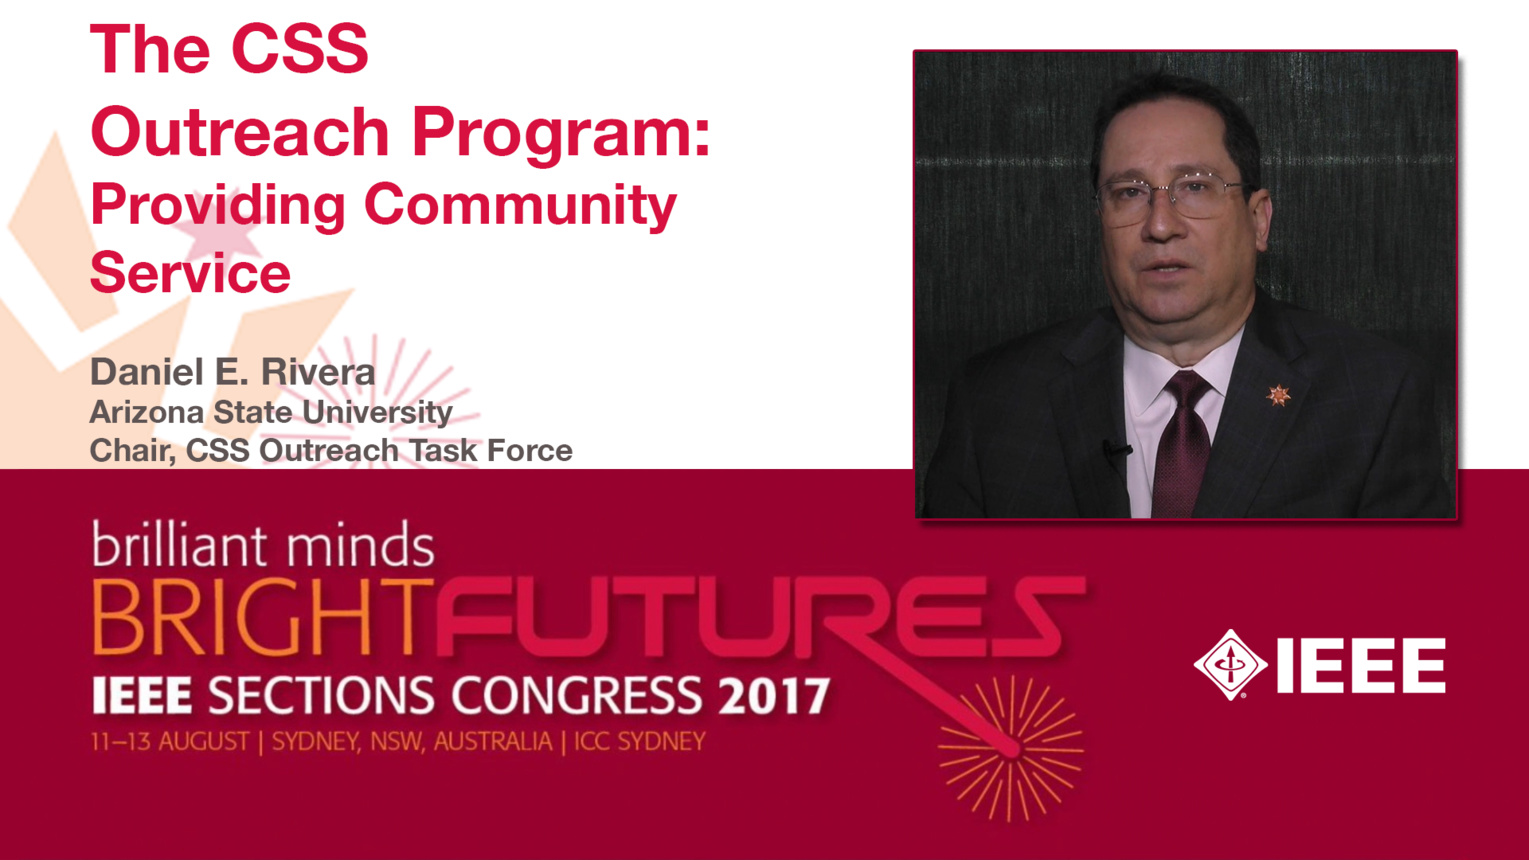 Daniel E. Rivera: The CSS Outreach Program: Providing Community Service - Studio Tech Talks: Sections Congress 2017